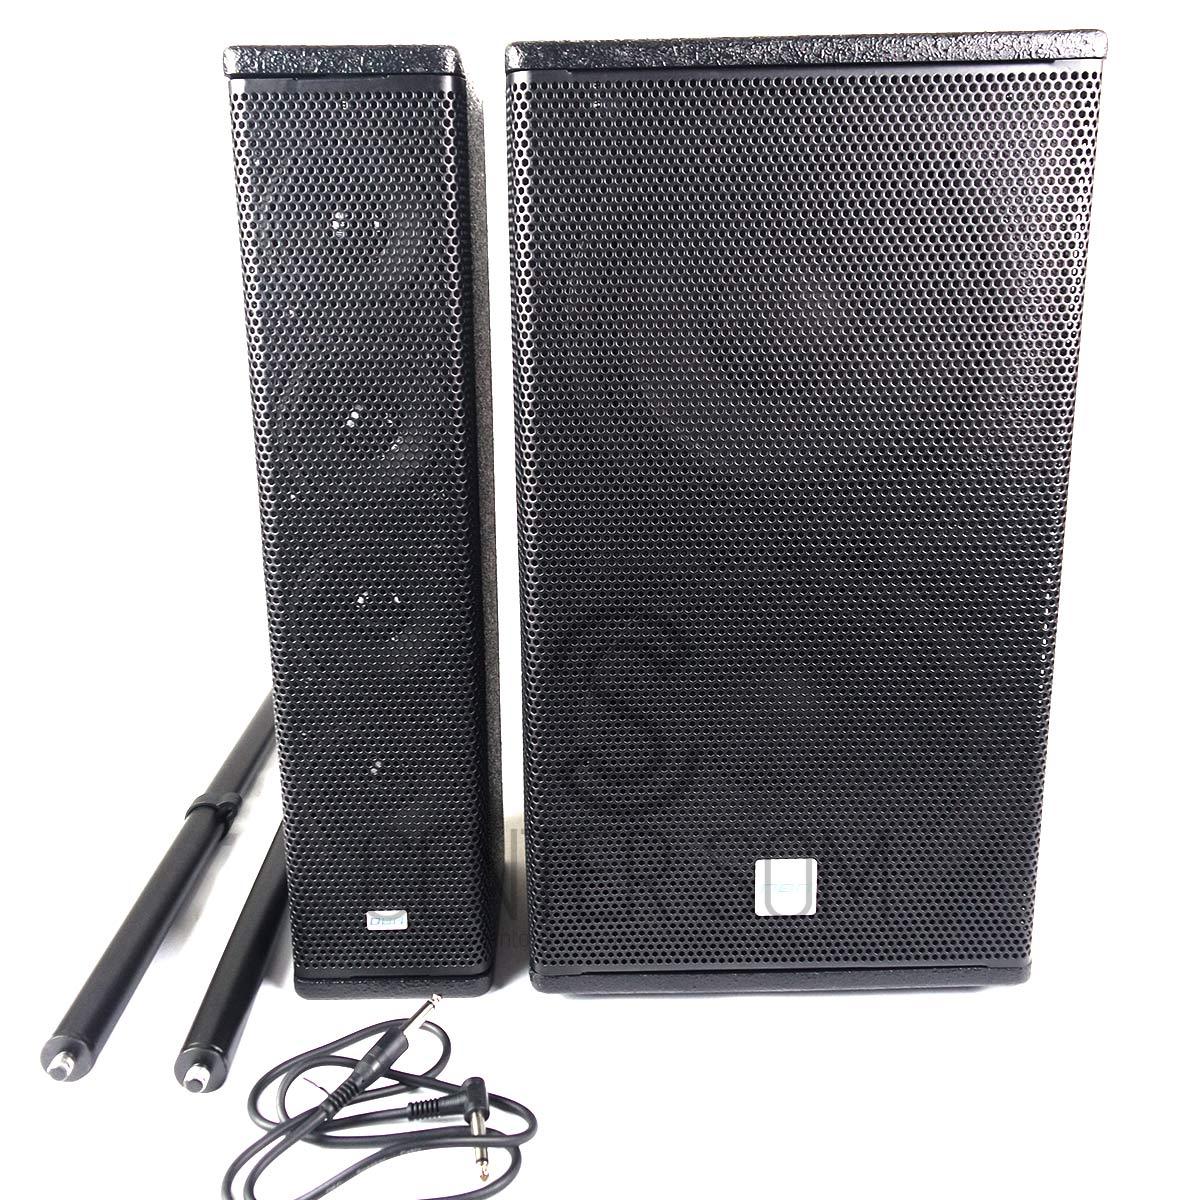 Sistema Amplificado Dbr Vertical Array Va1800 700w Rms SubWoofer